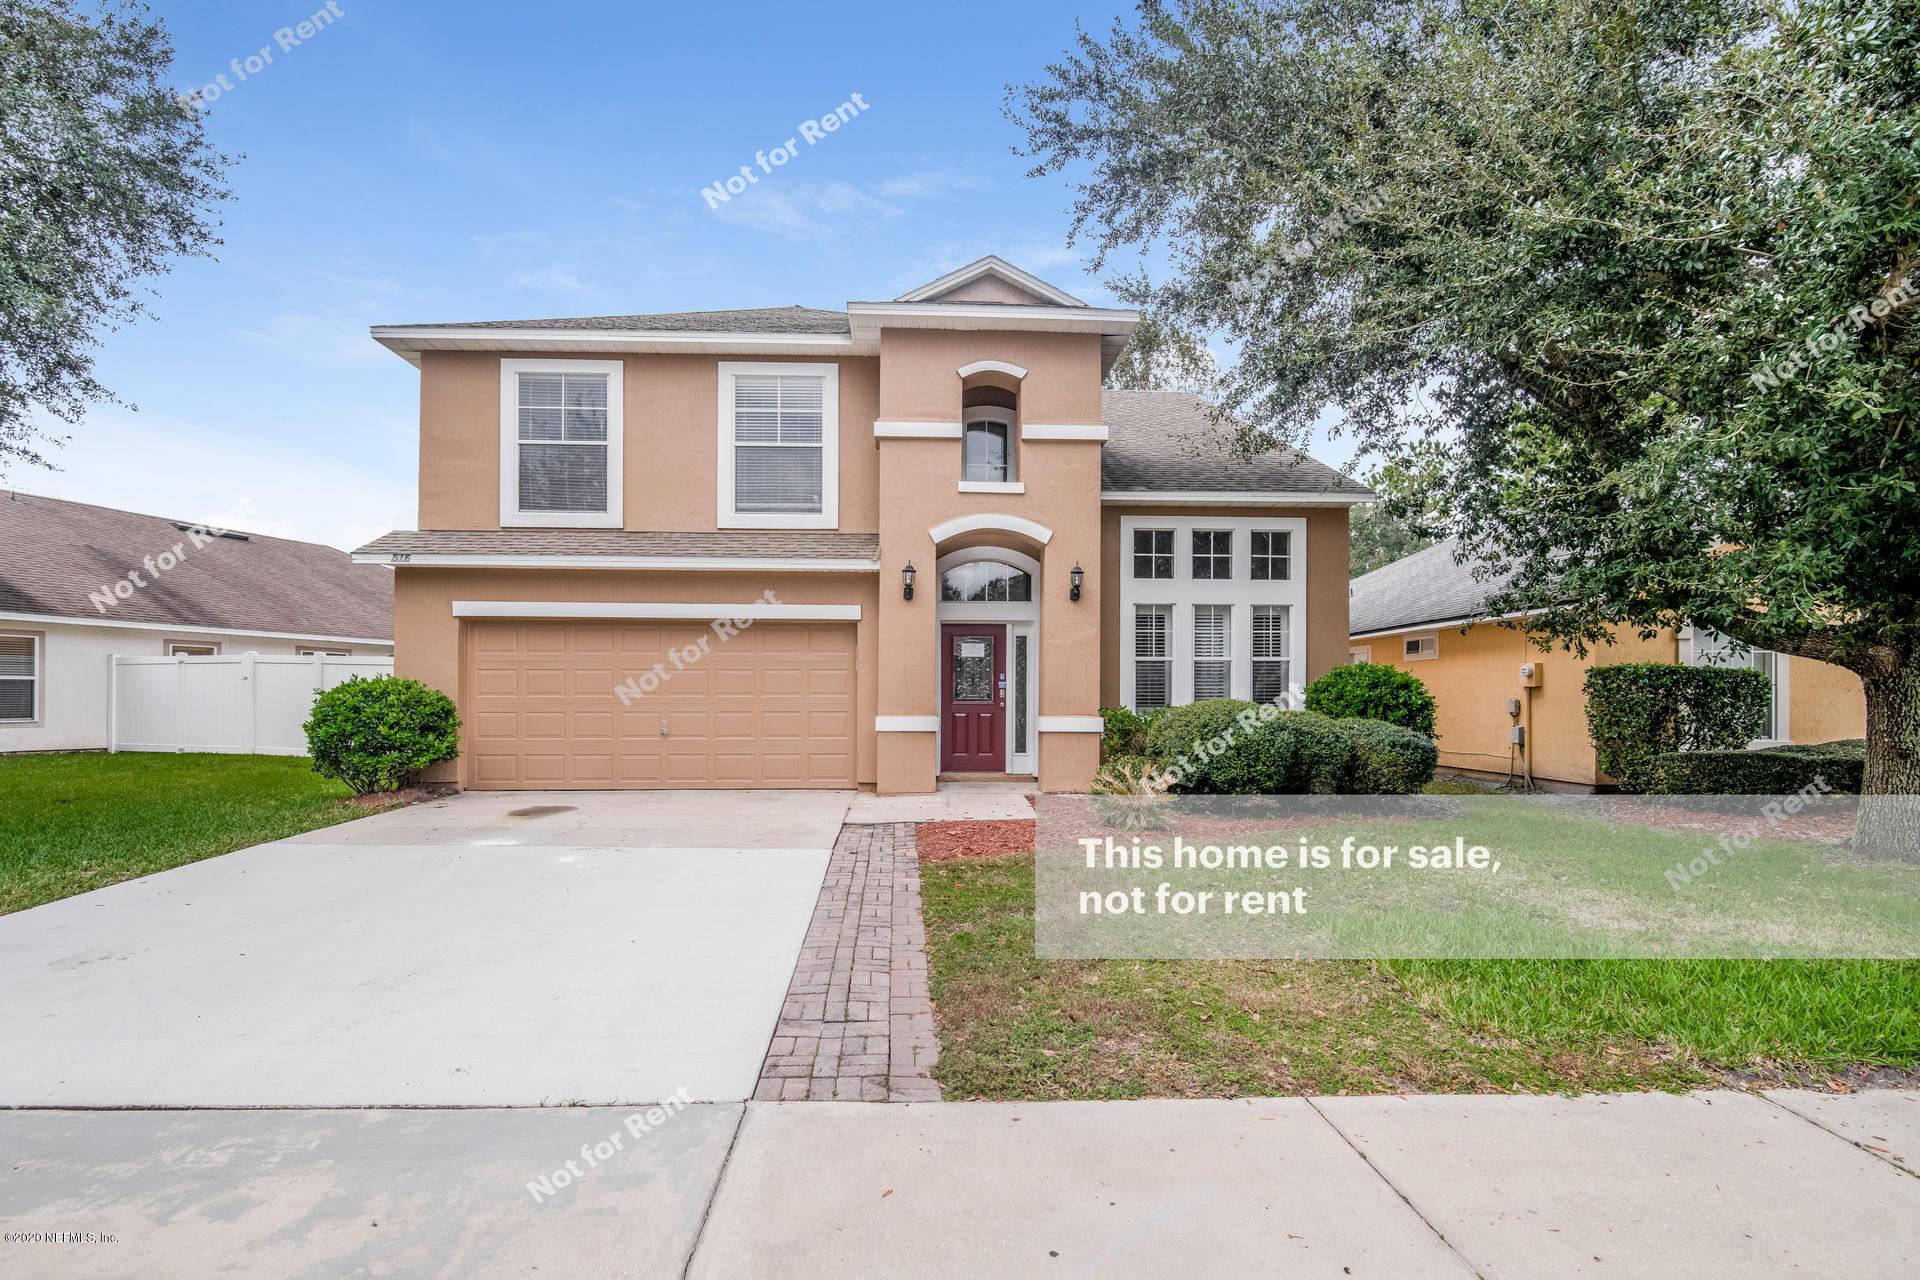 516 MILLSTONE, ORANGE PARK, FLORIDA 32065, 4 Bedrooms Bedrooms, ,3 BathroomsBathrooms,Residential,For sale,MILLSTONE,1088031